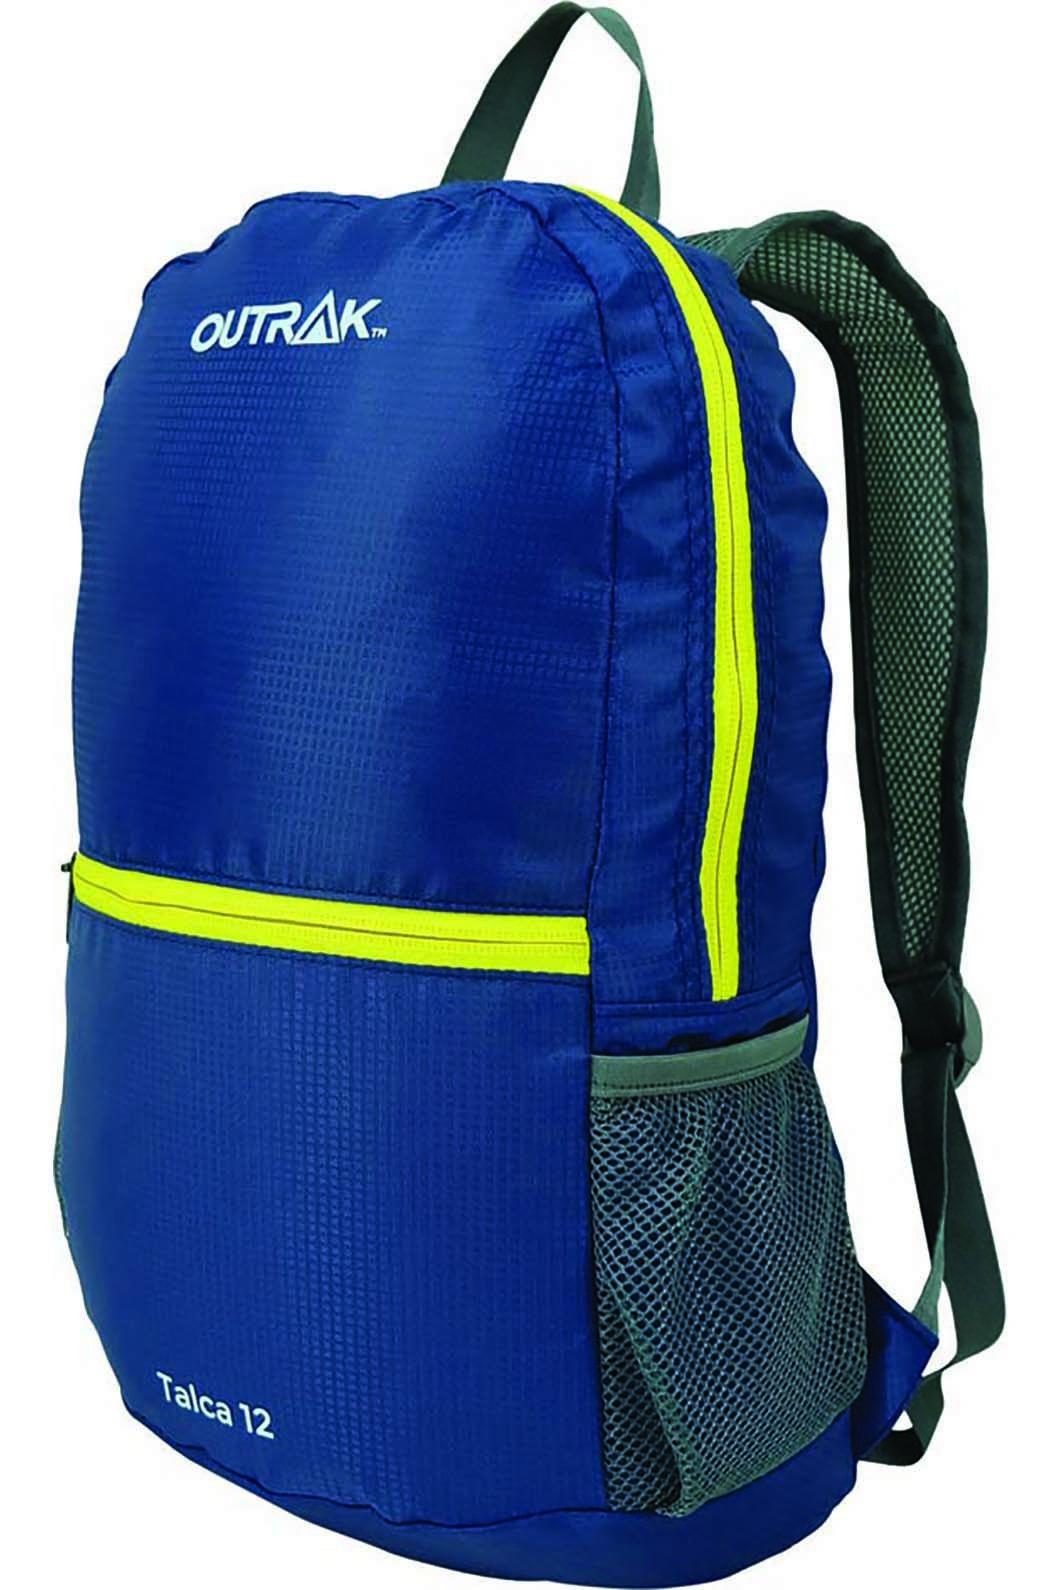 Outrak Talca Foldable DaypackL, None, hi-res